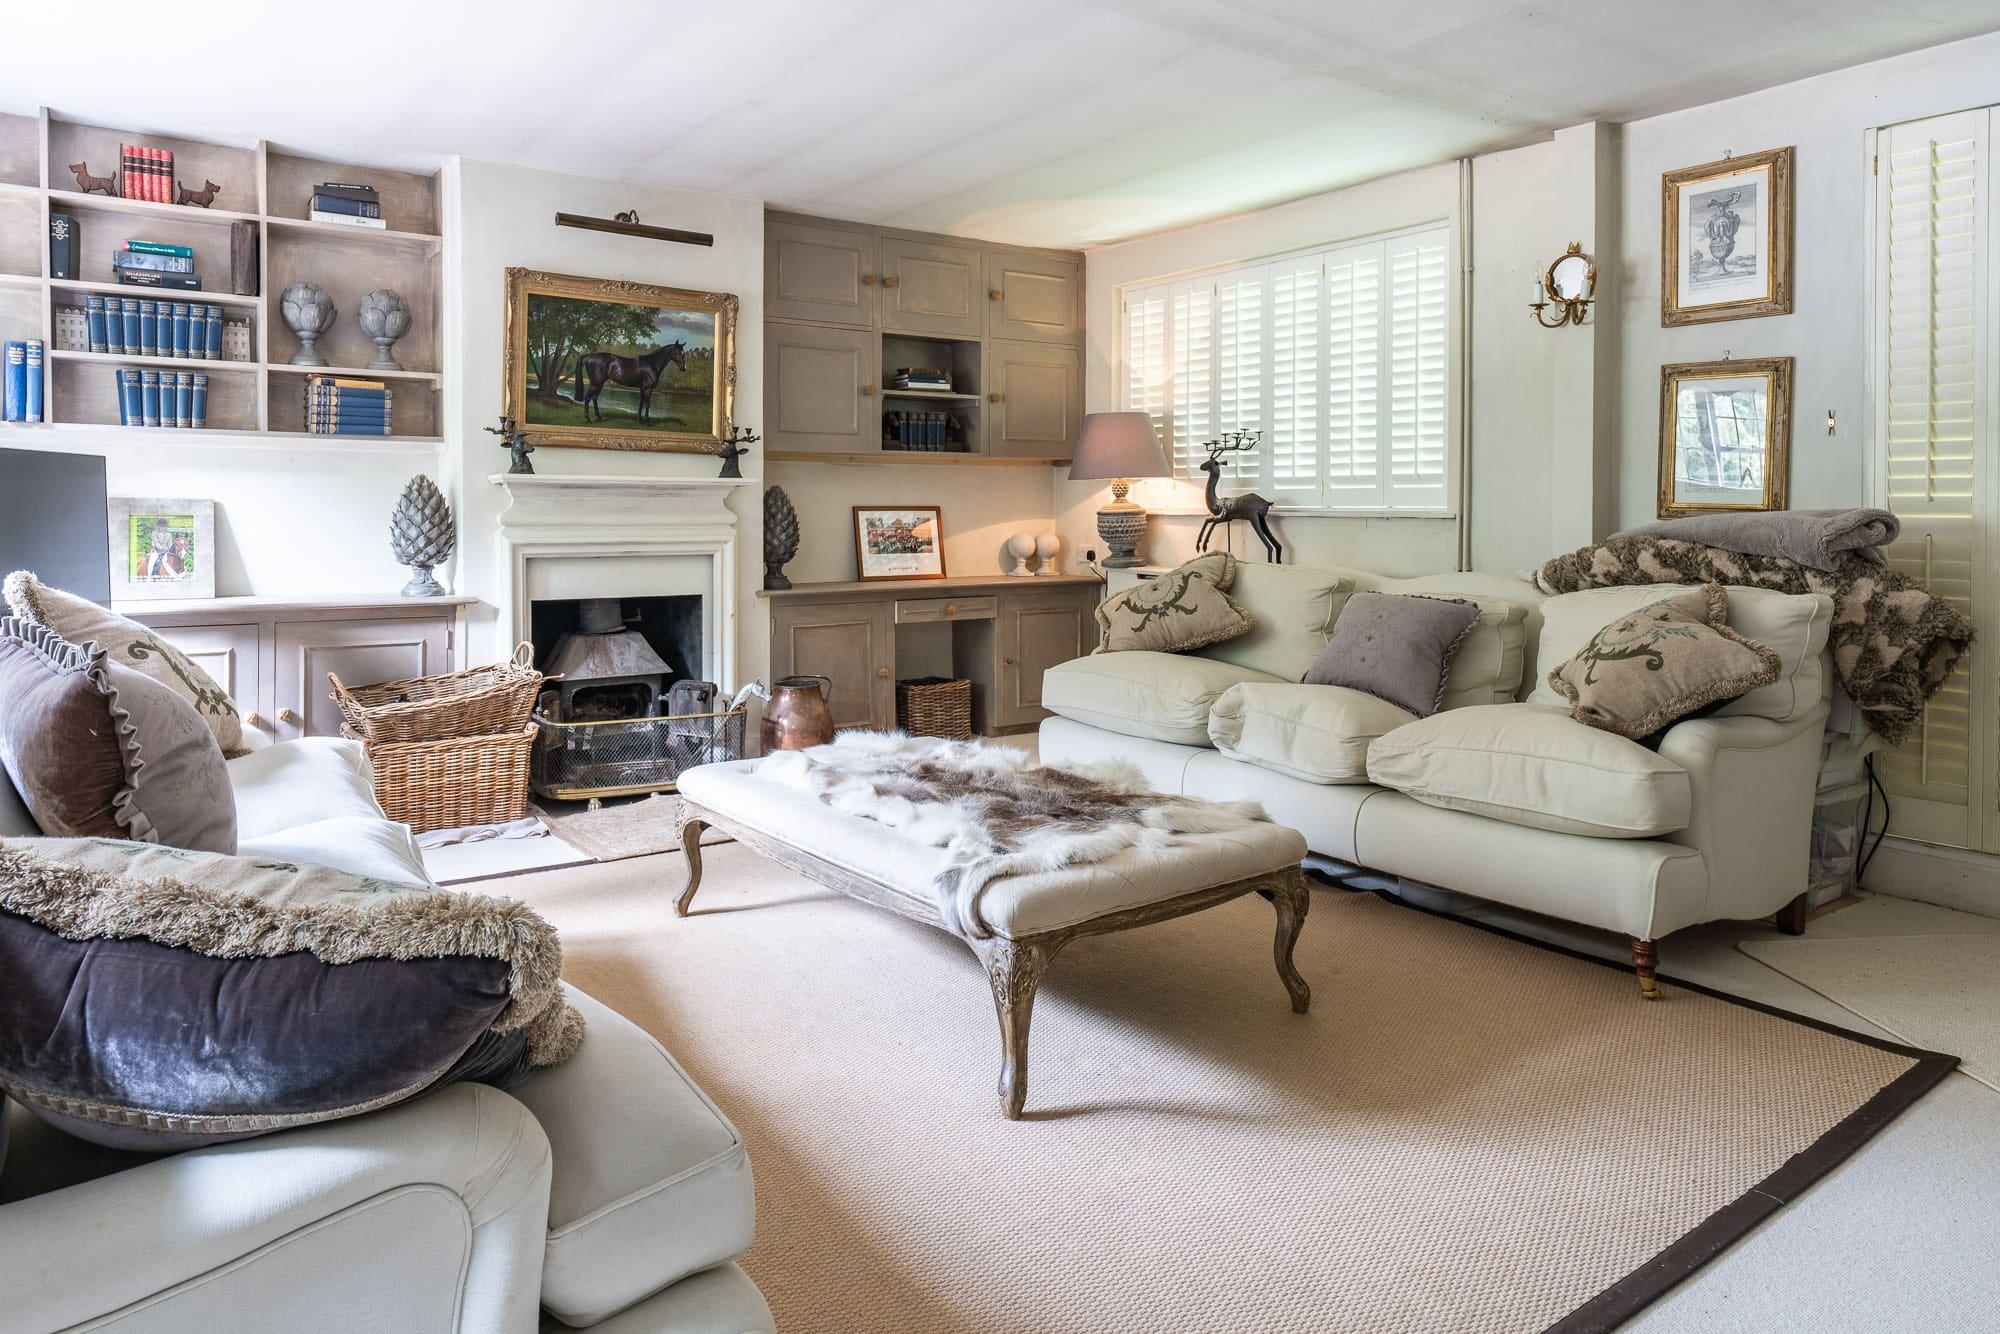 cream and beige room ideas